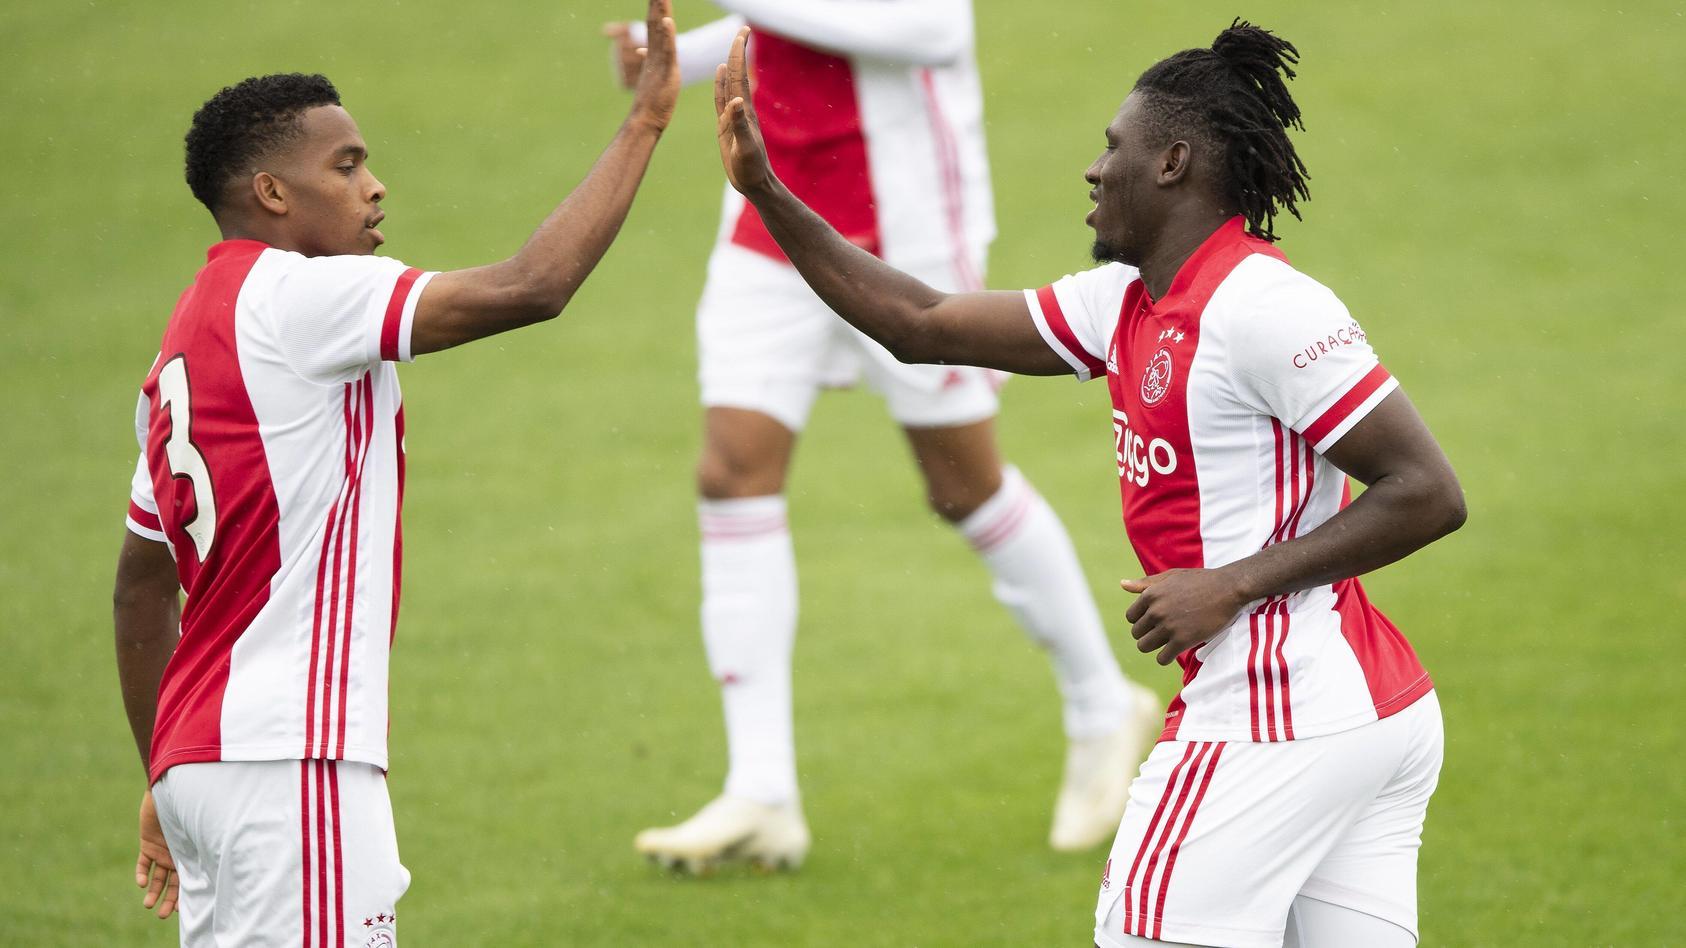 AMSTERDAM , 25-08-2020 , Sportpark de Toekomst , football, friendly testmatch, Season 2020-2021 , Ajax - Holstein Kiel